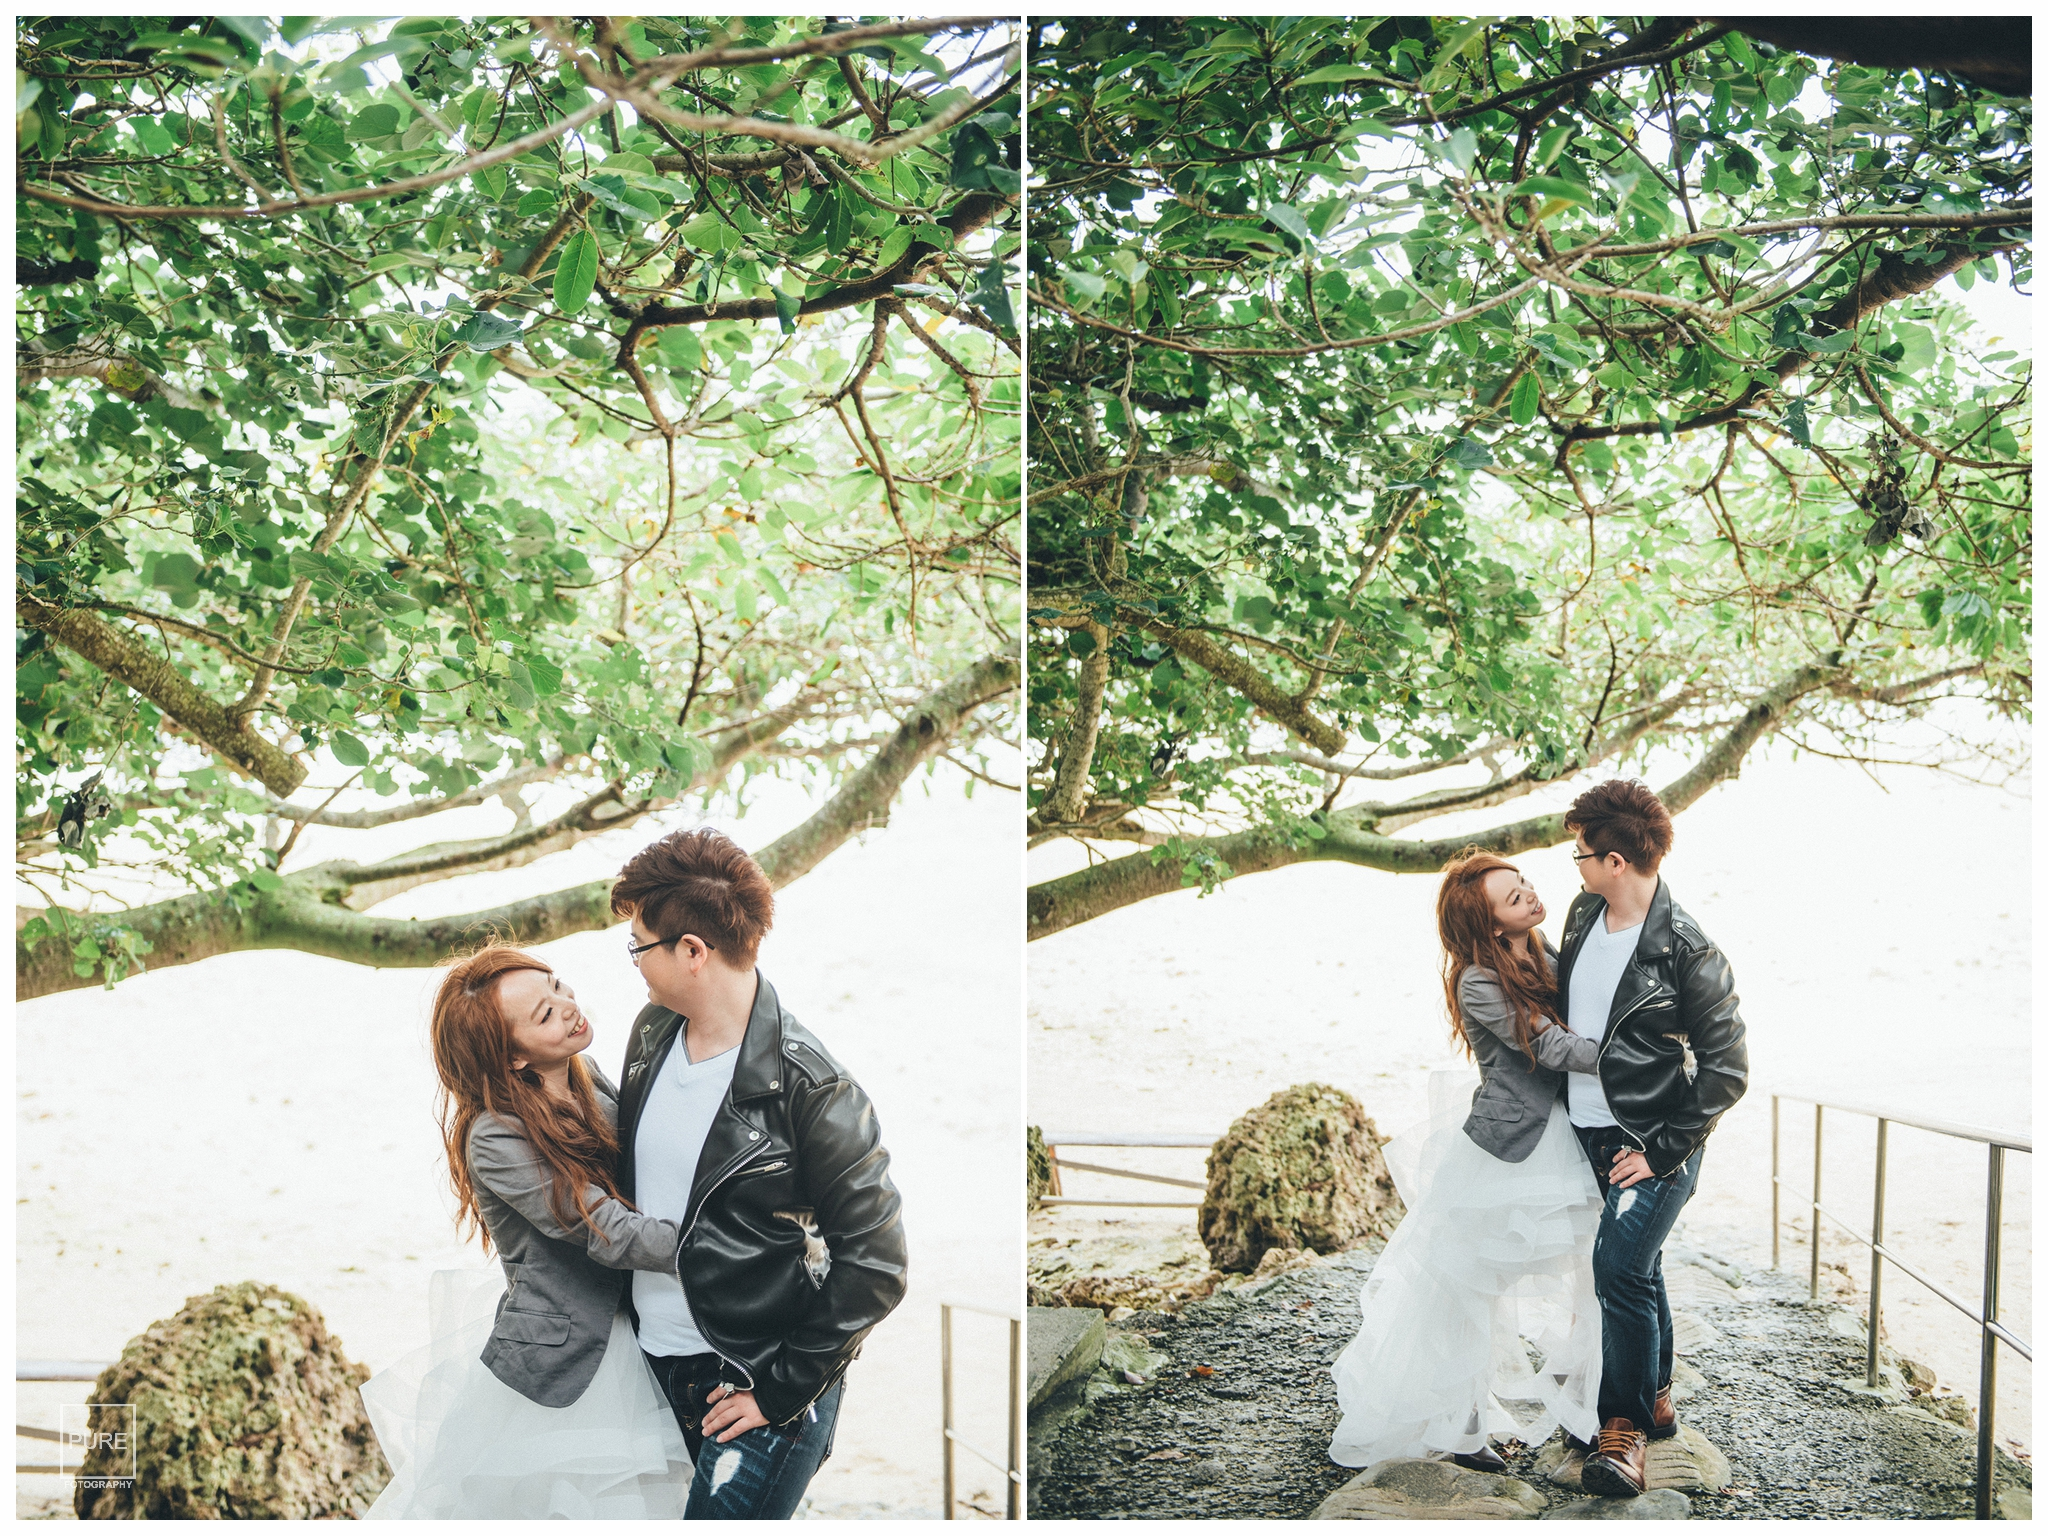 沖繩,Okinawa,婚紗,海邊,海外婚紗